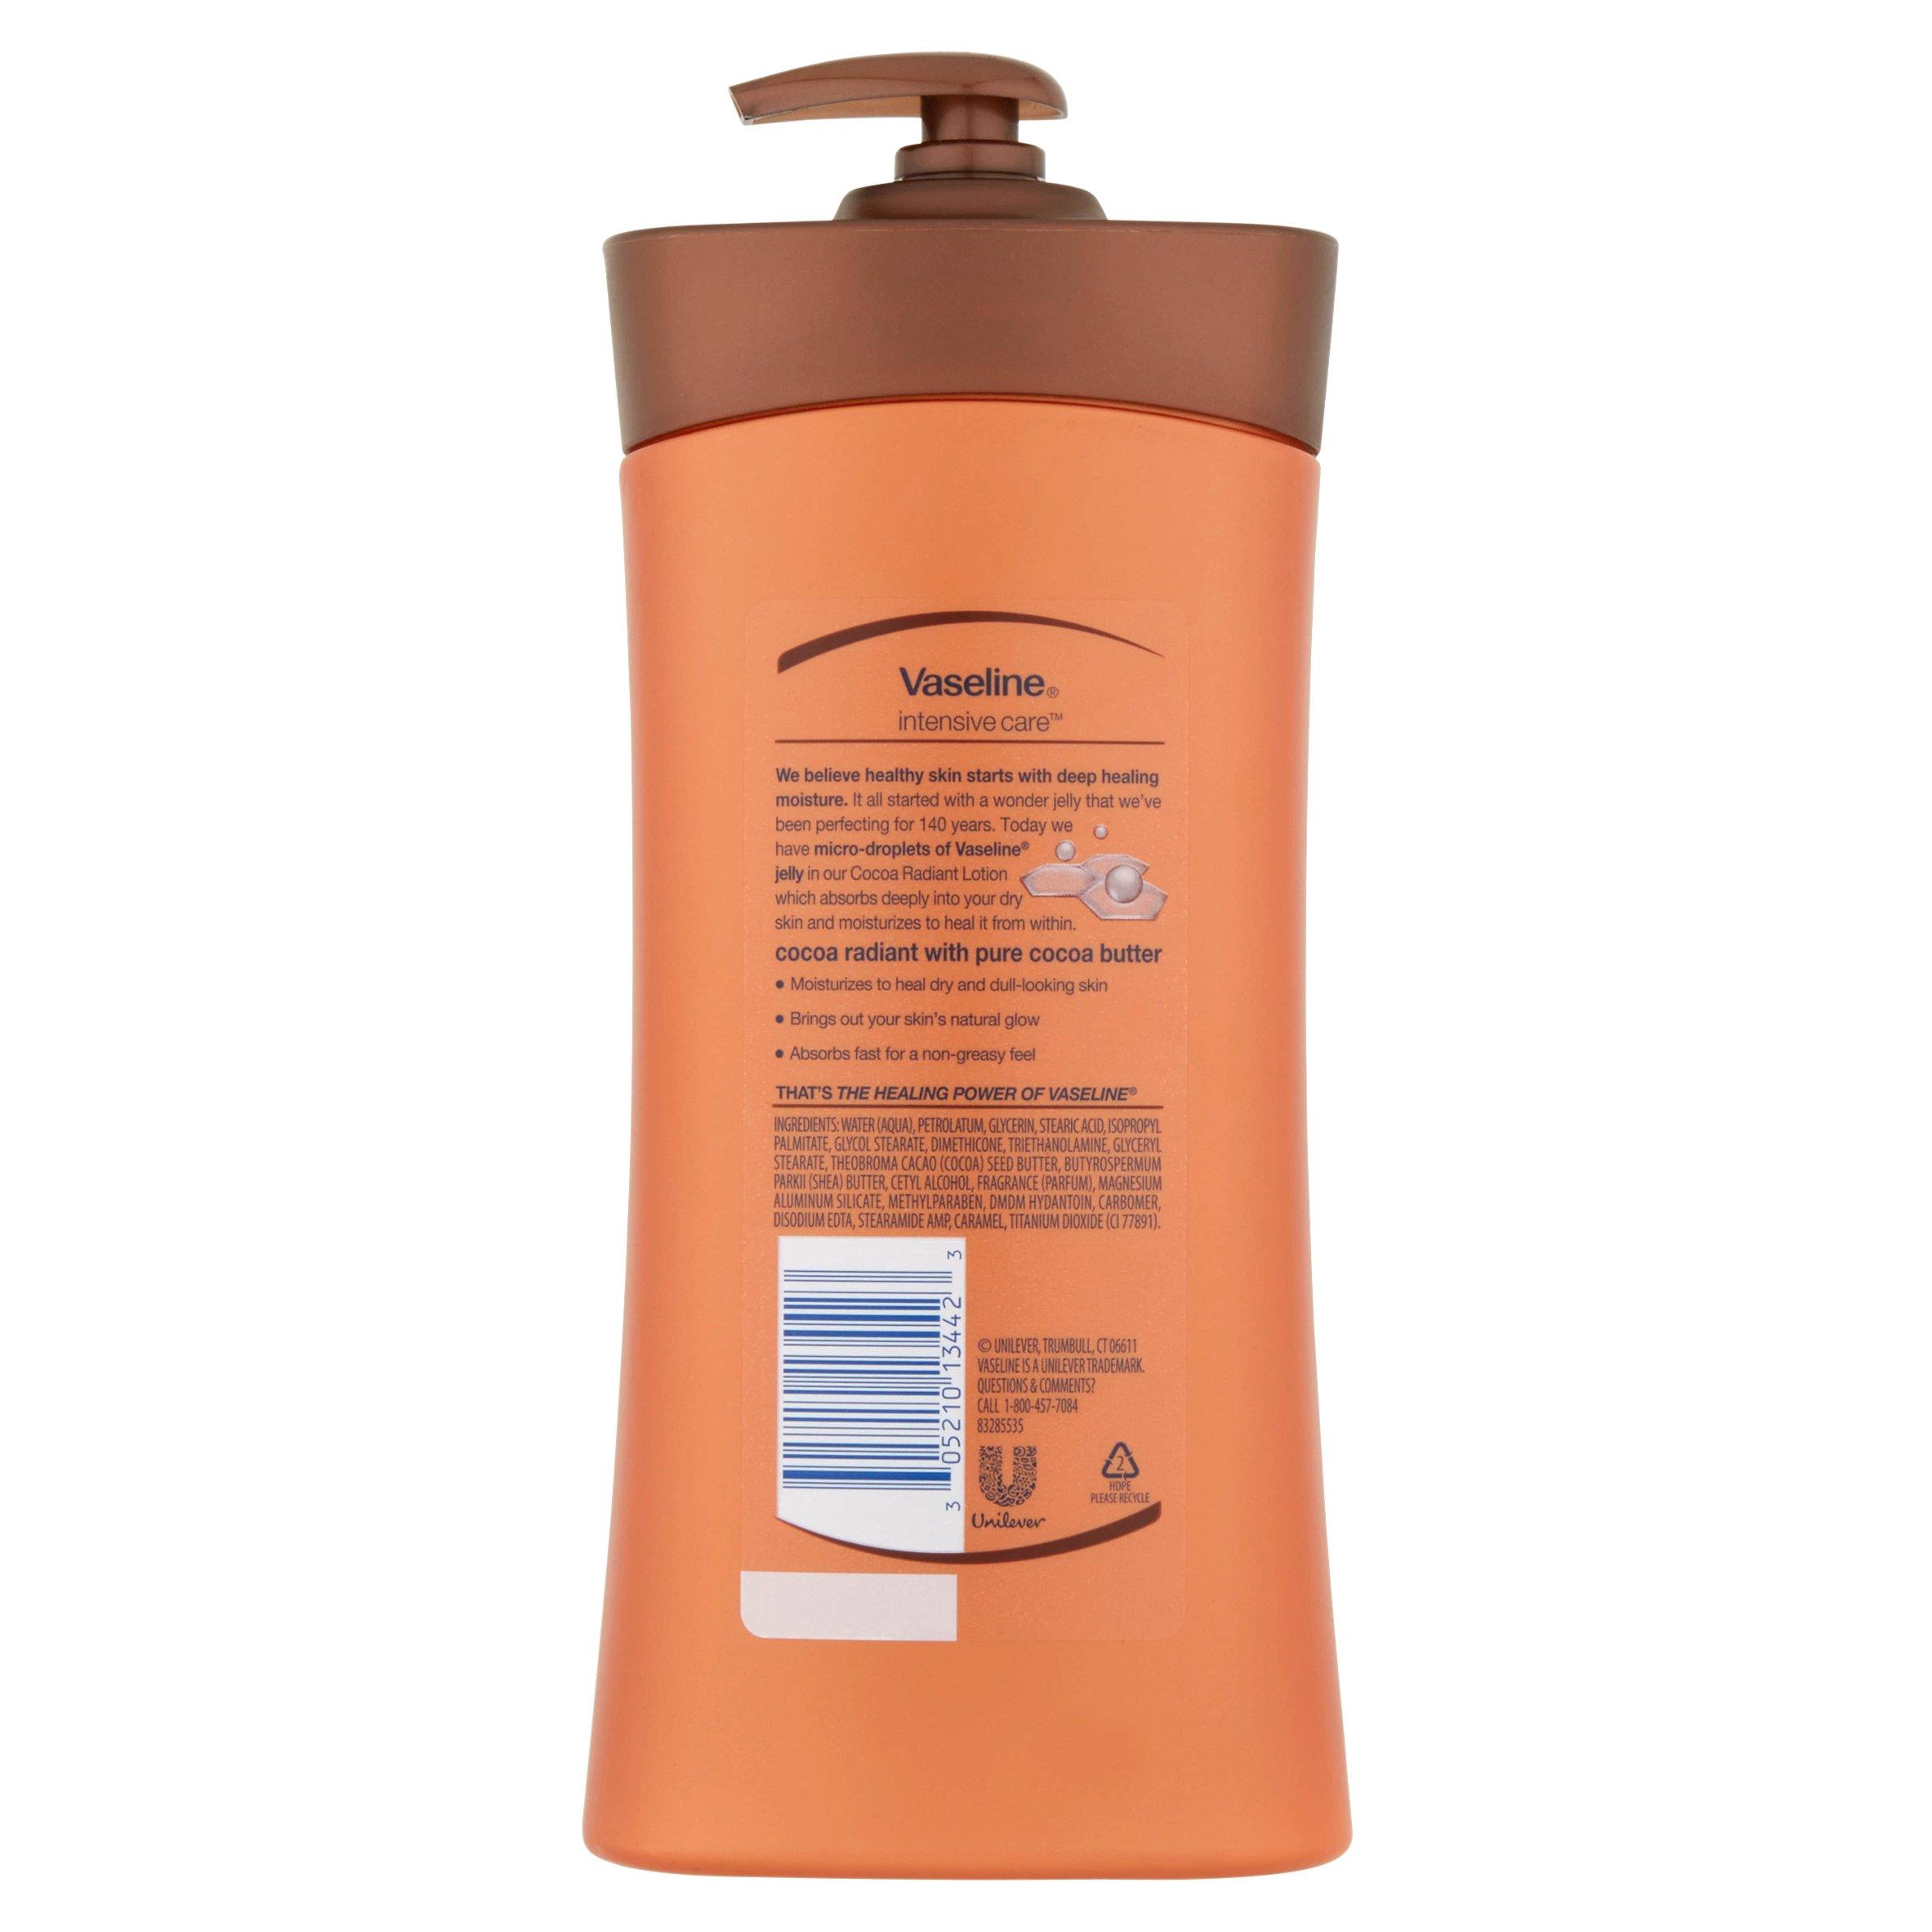 Home 187 schlafen amp bad 187 wellness pur - Vaseline Intensive Care Cocoa Radiant Non Greasy Lotion 20 3 Fl Oz Walmart Com